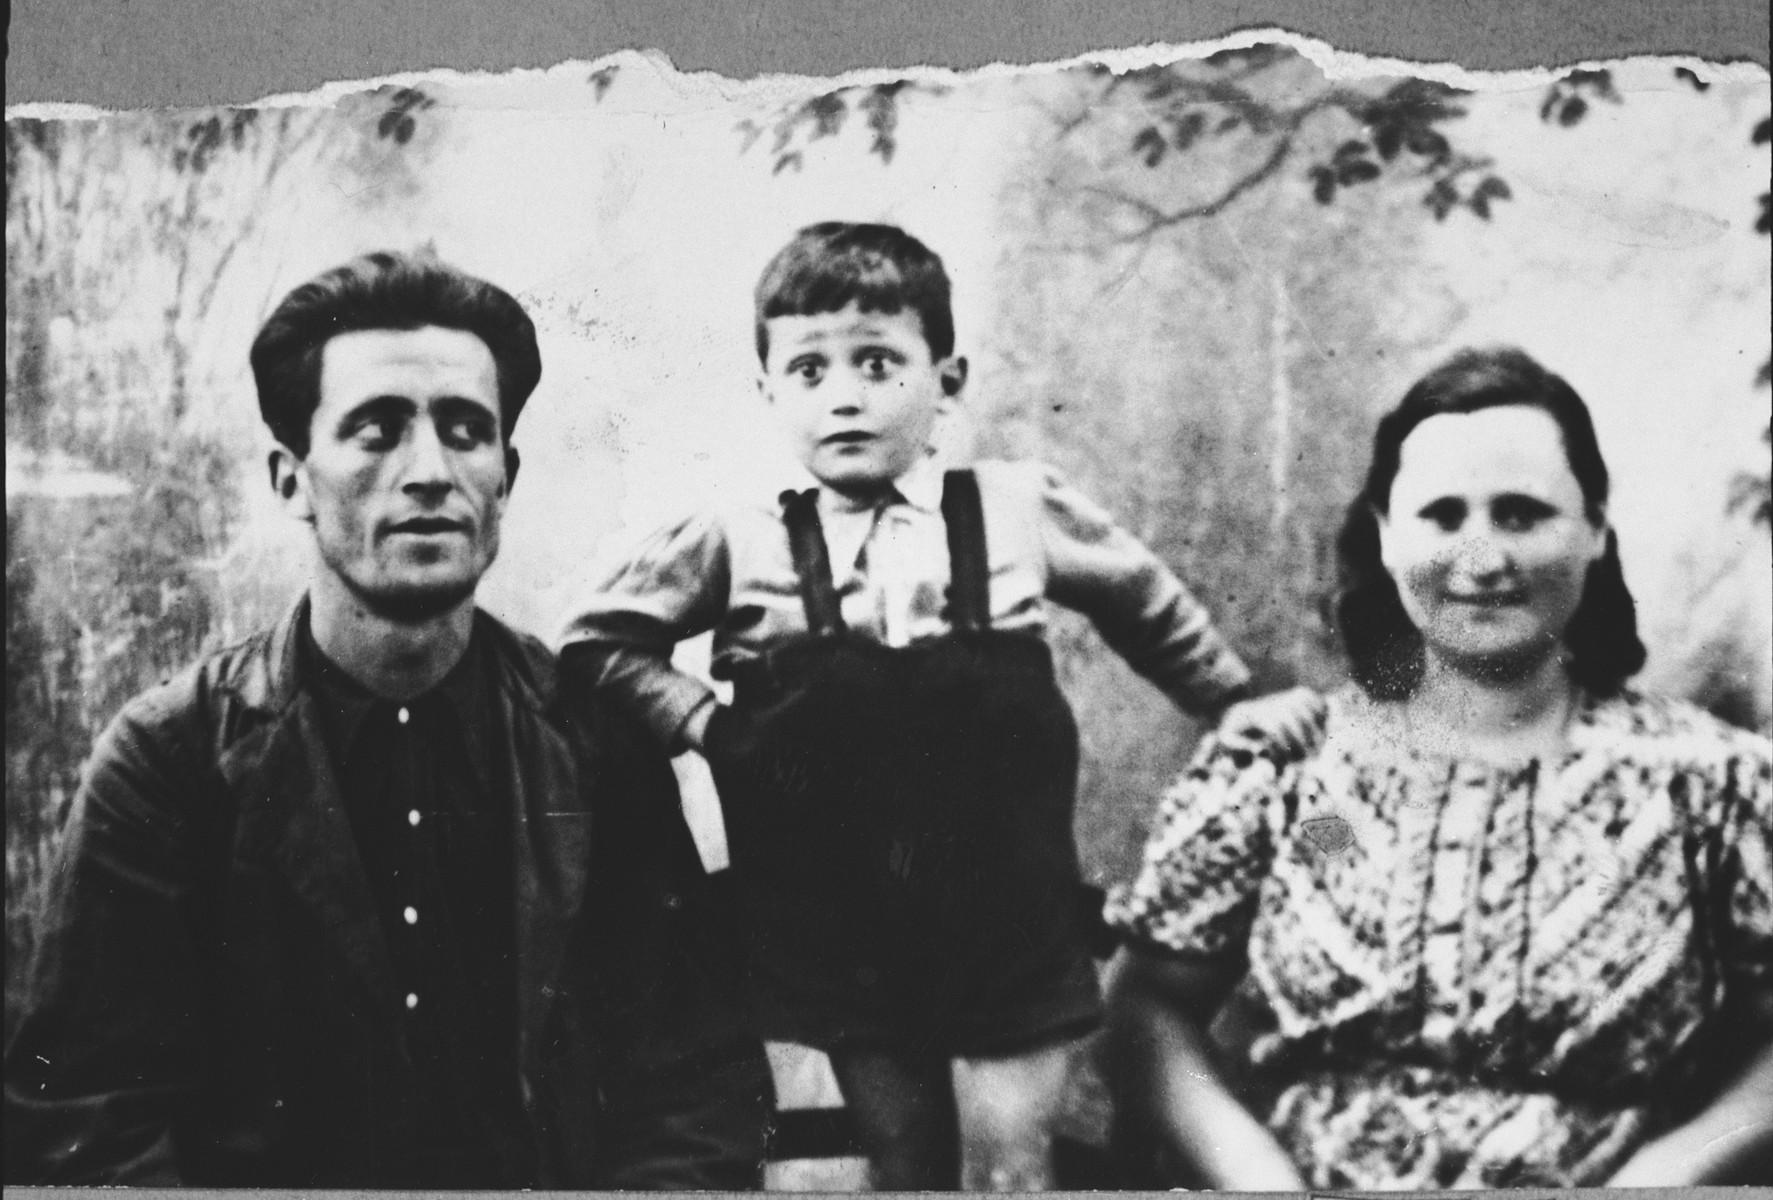 Portrait of Todoros Levi, son of Haim Levi, Todoros' wife, Sara, and [his son], Haim.  Todoros was a gardner.  They lived at Mitrovatska 7 in Bitola.